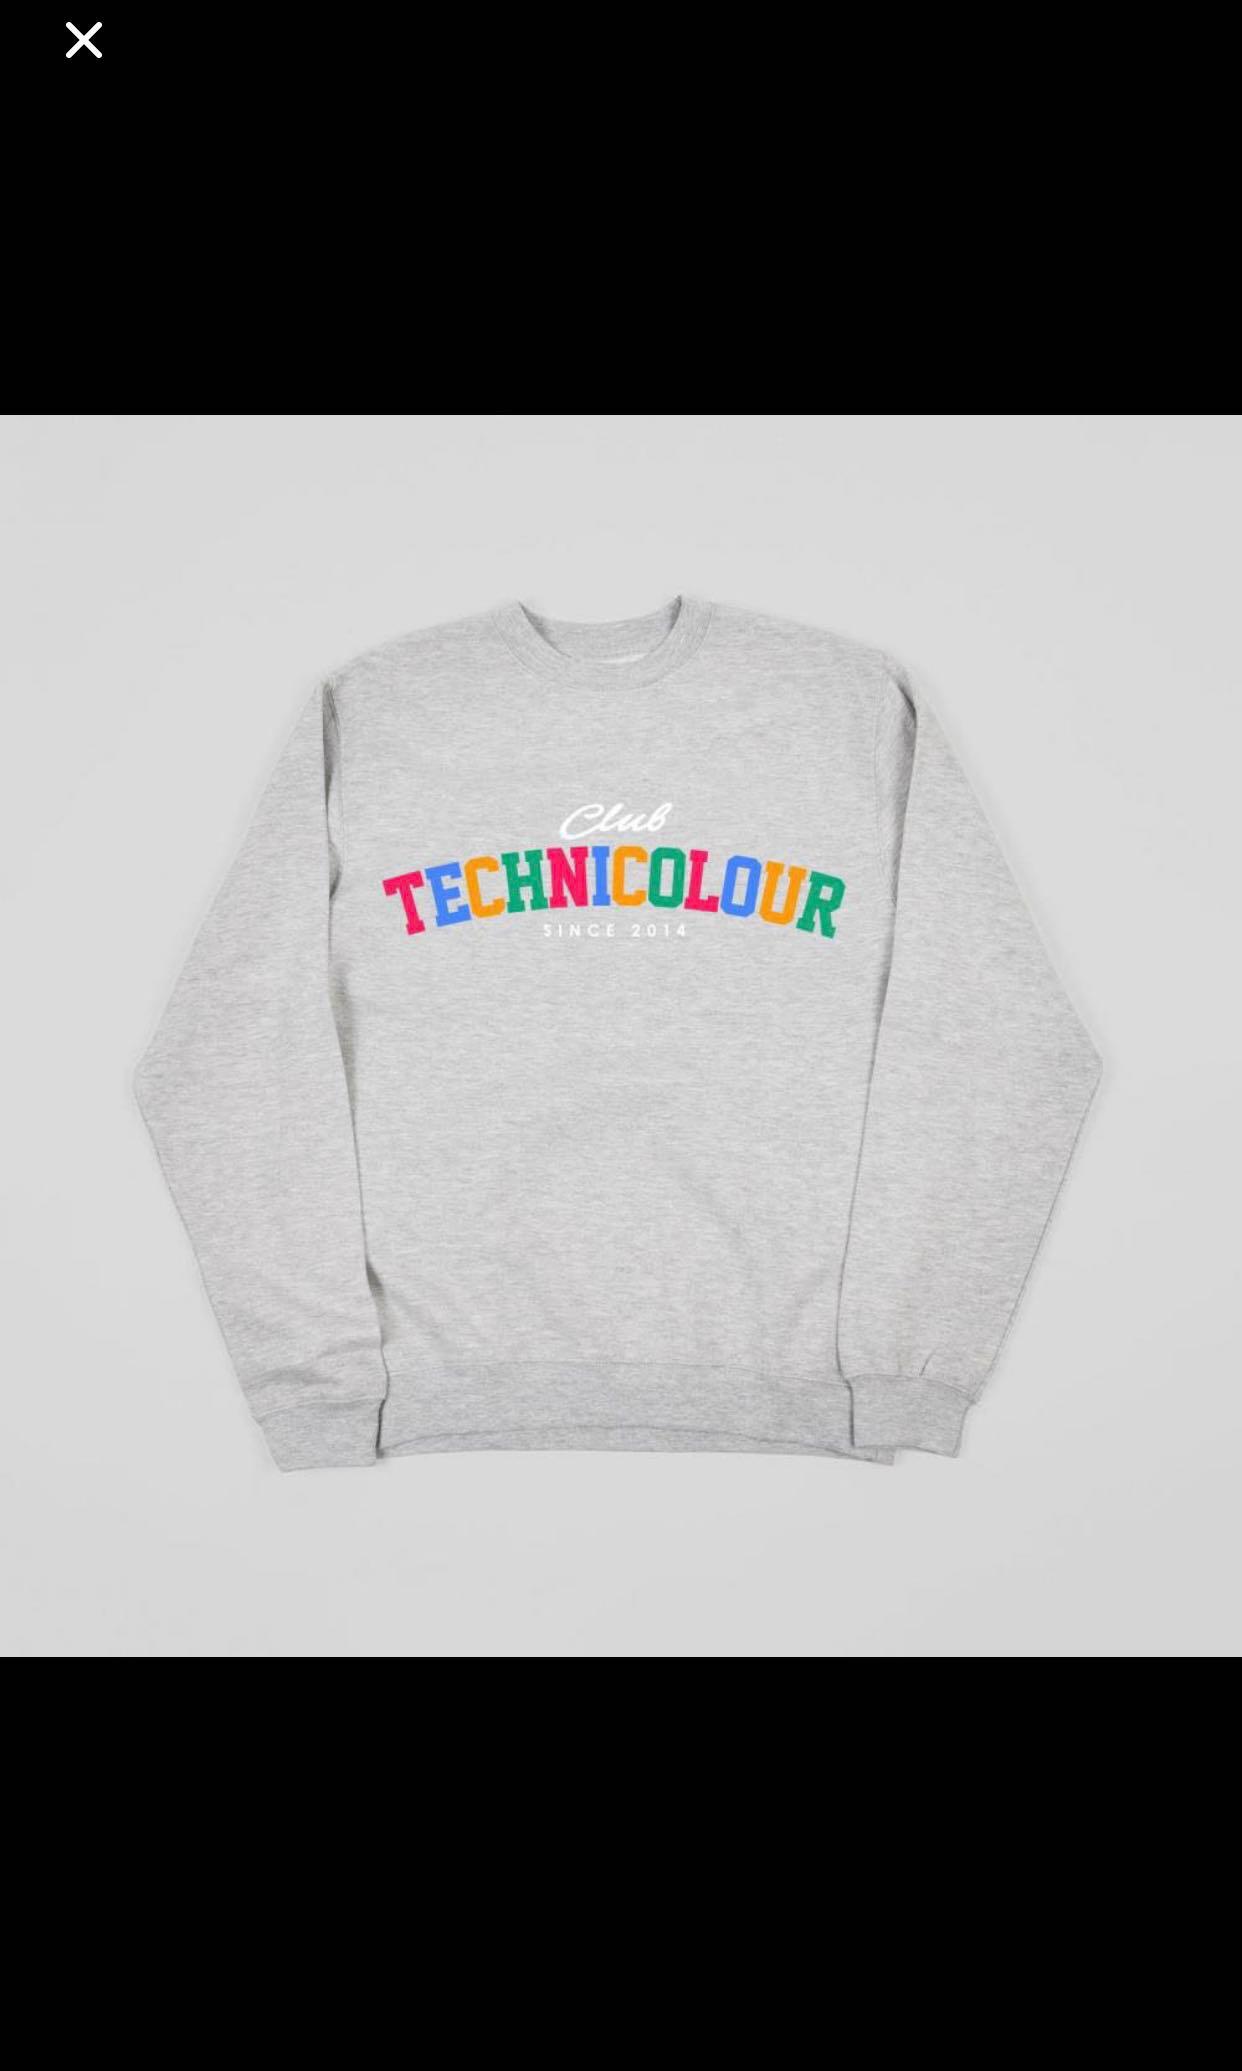 8aa4c7de9132 Oh Wonder Club Technicolour Sweater Pullover Merchandise, Men's ...